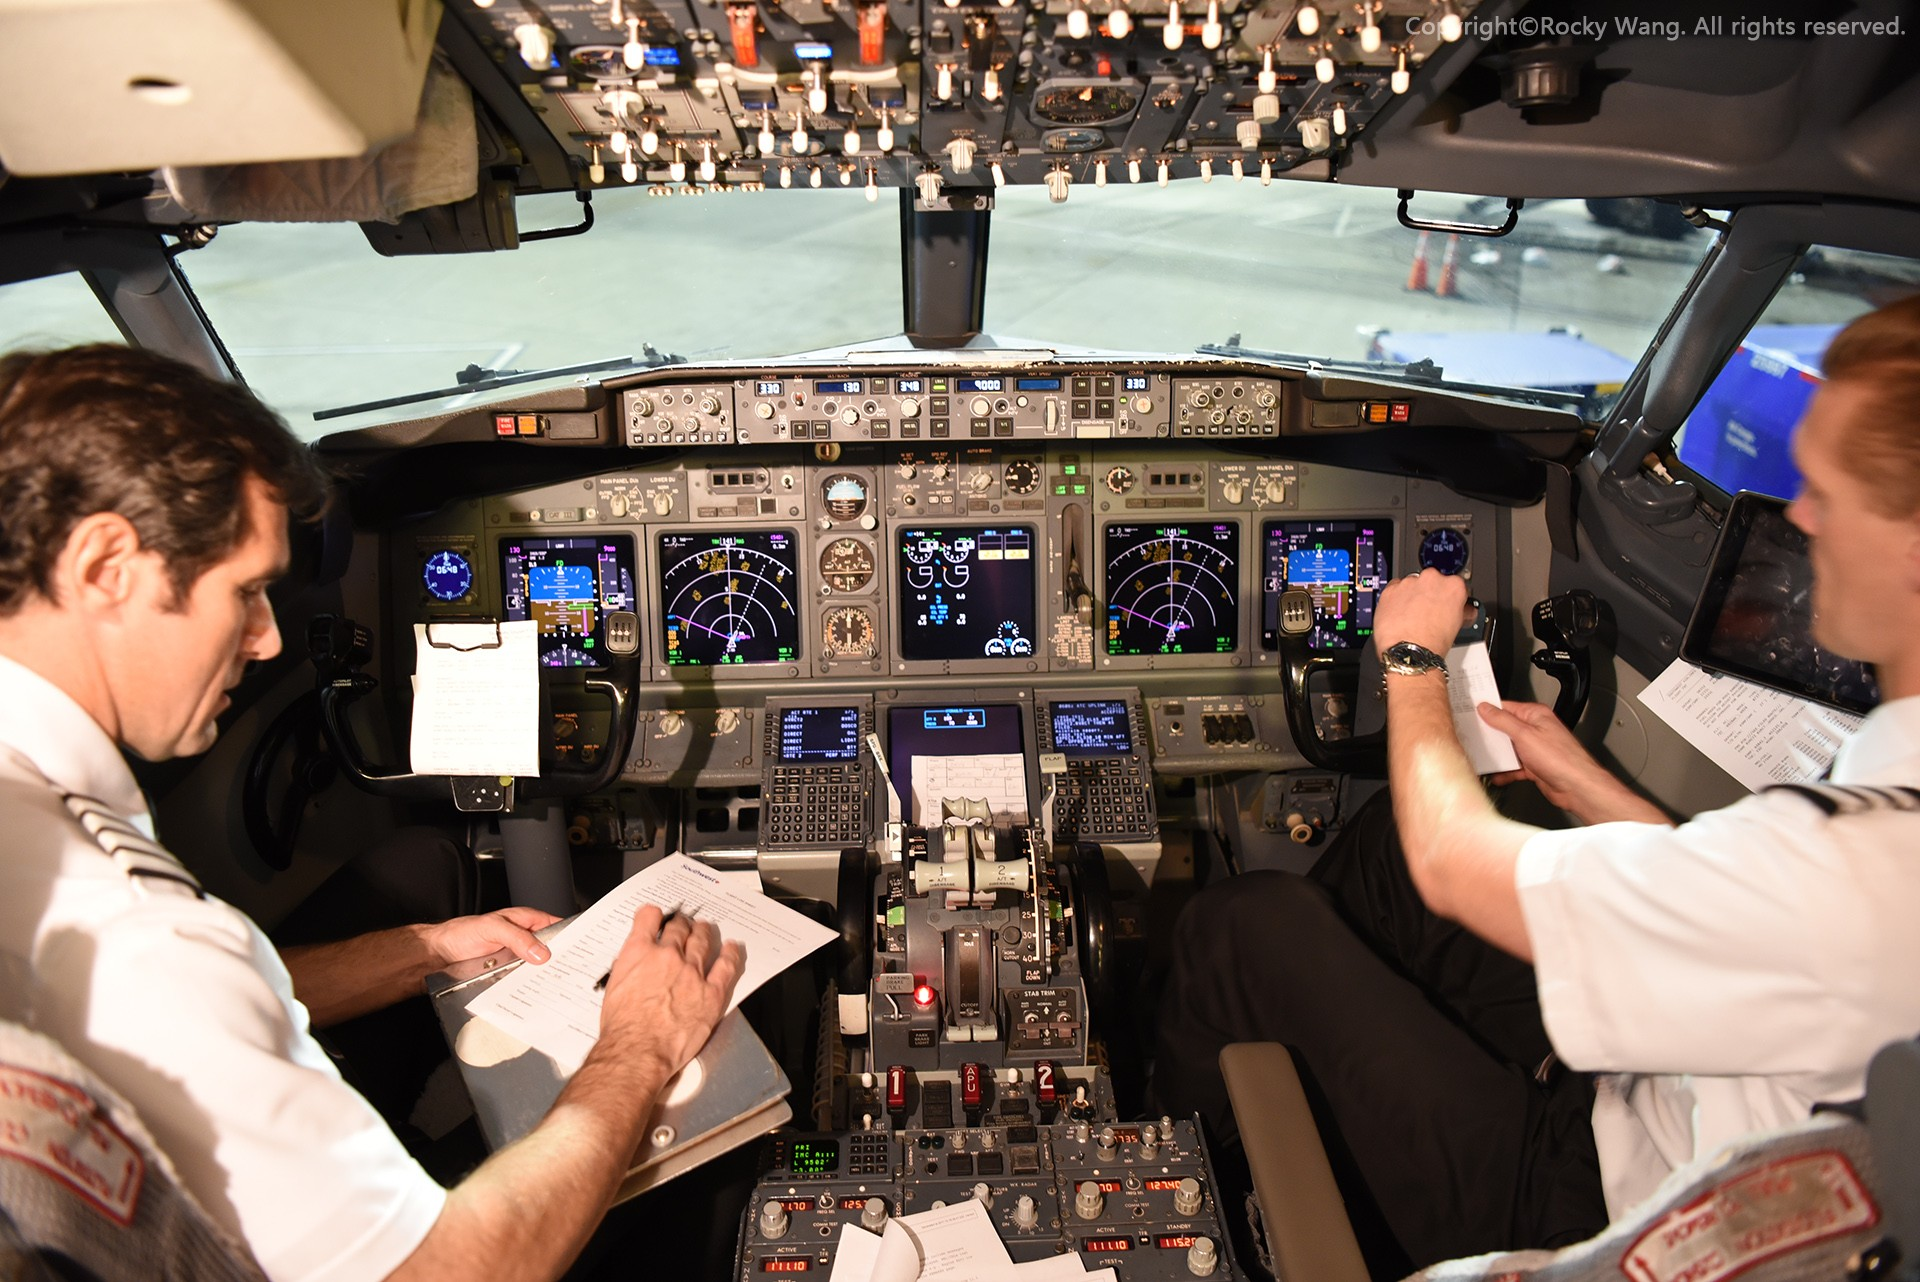 Re:[原创]简易版游记,纪念一次30段的环球飞行和一些碎碎念 BOEING 737-7H4 N928WN Sacramento Int'l Airport